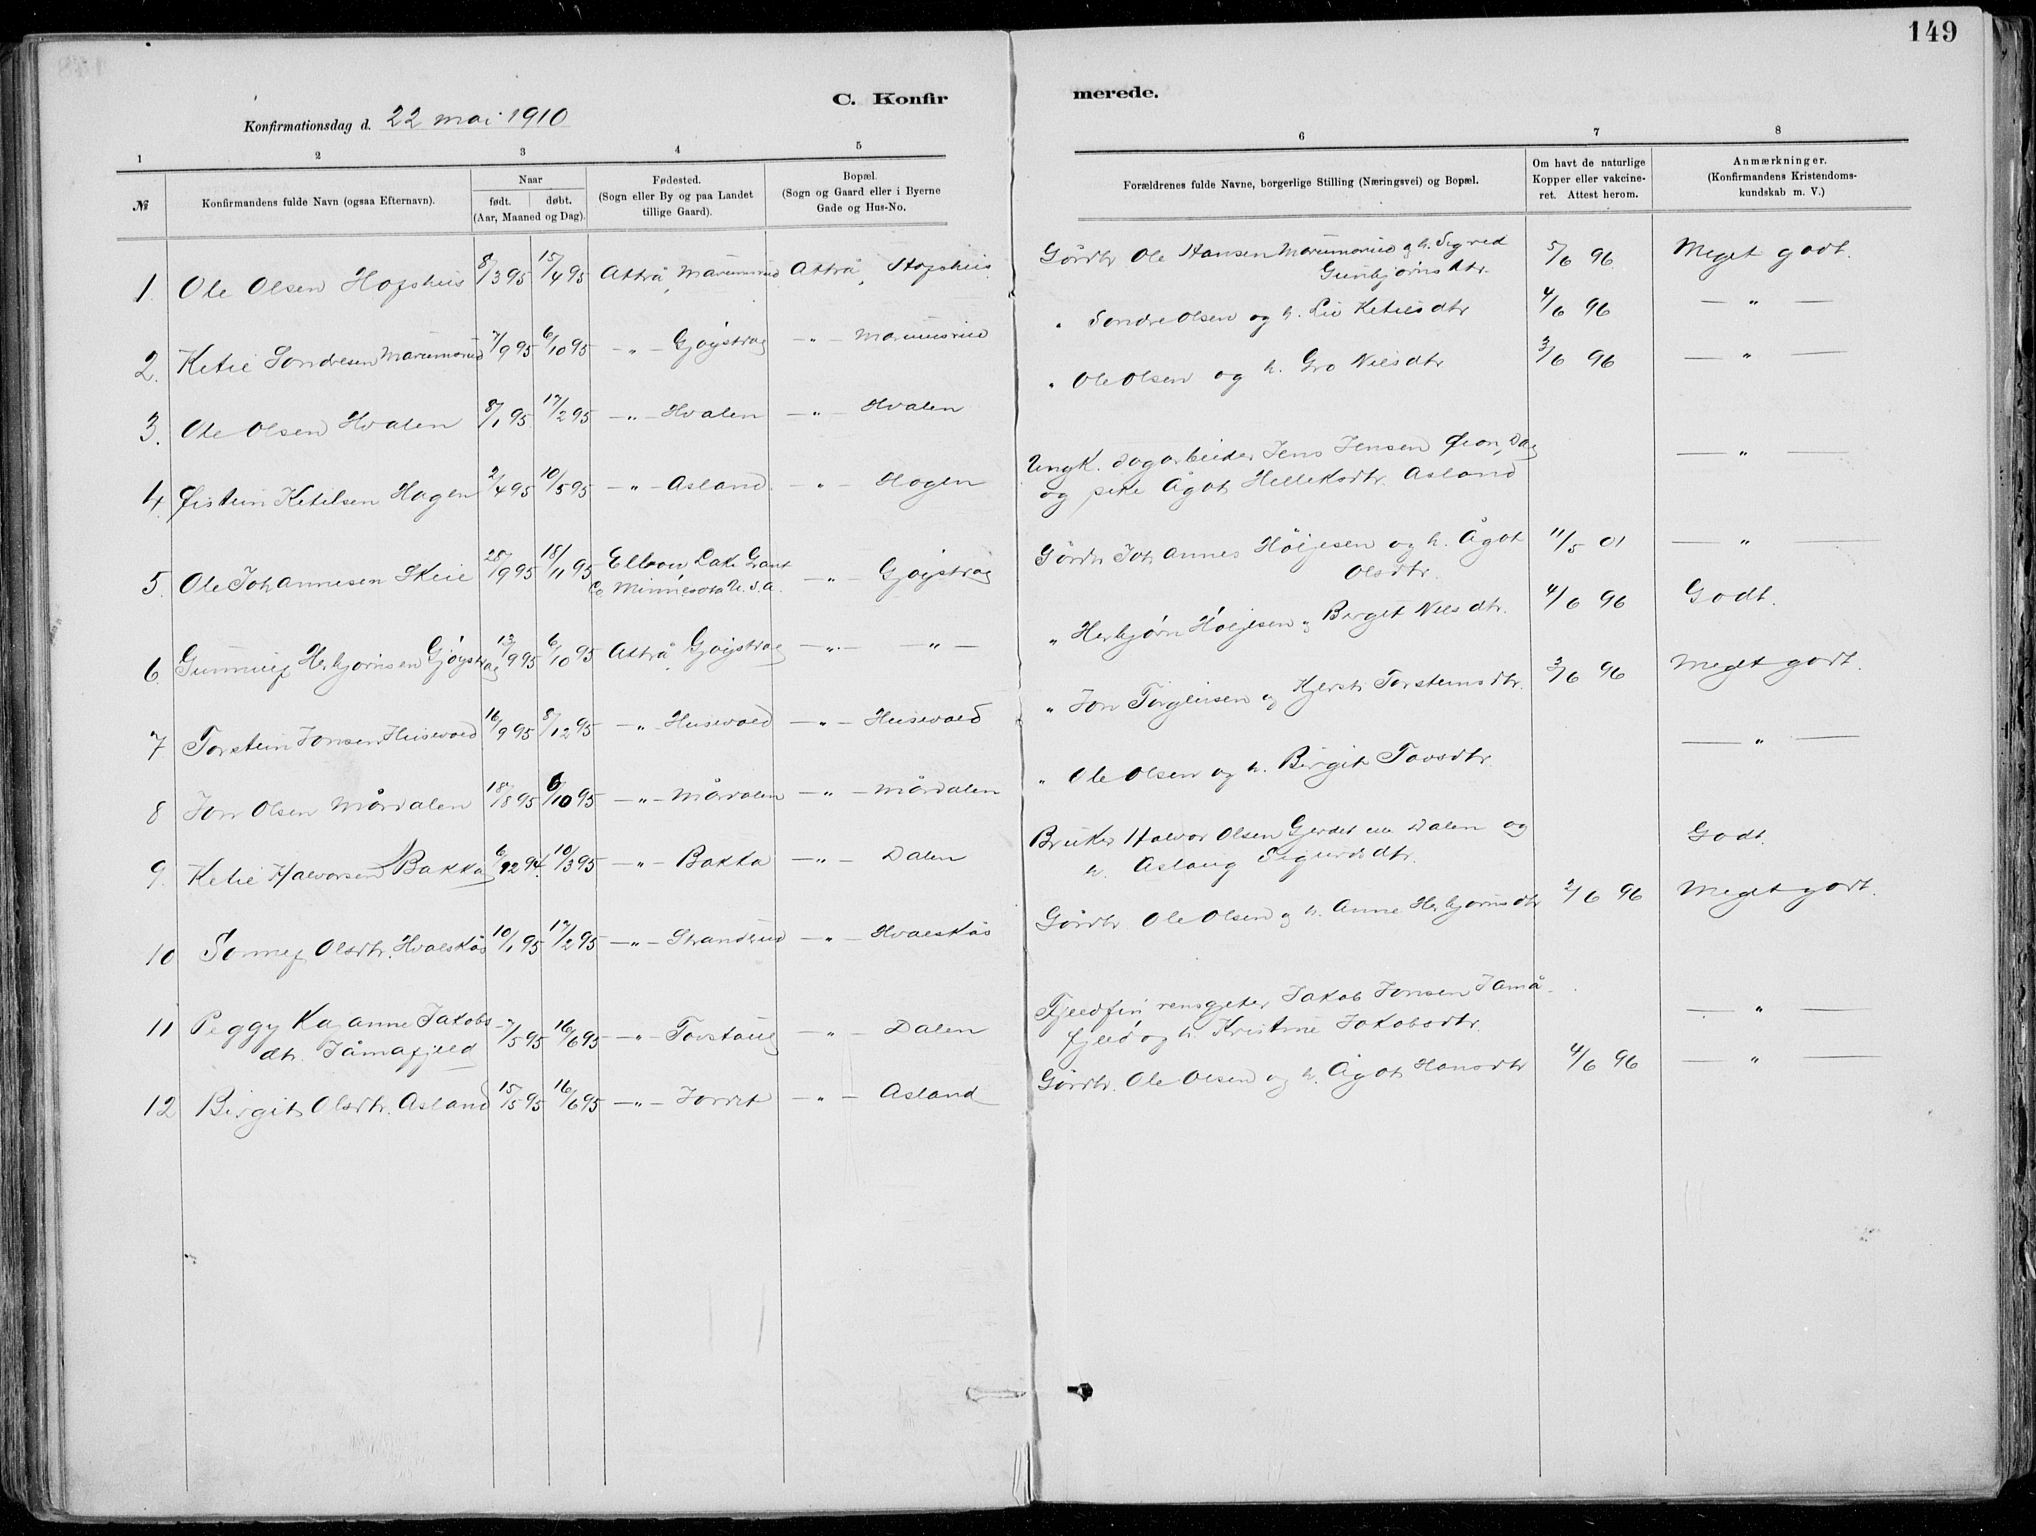 SAKO, Tinn kirkebøker, F/Fa/L0007: Ministerialbok nr. I 7, 1878-1922, s. 149